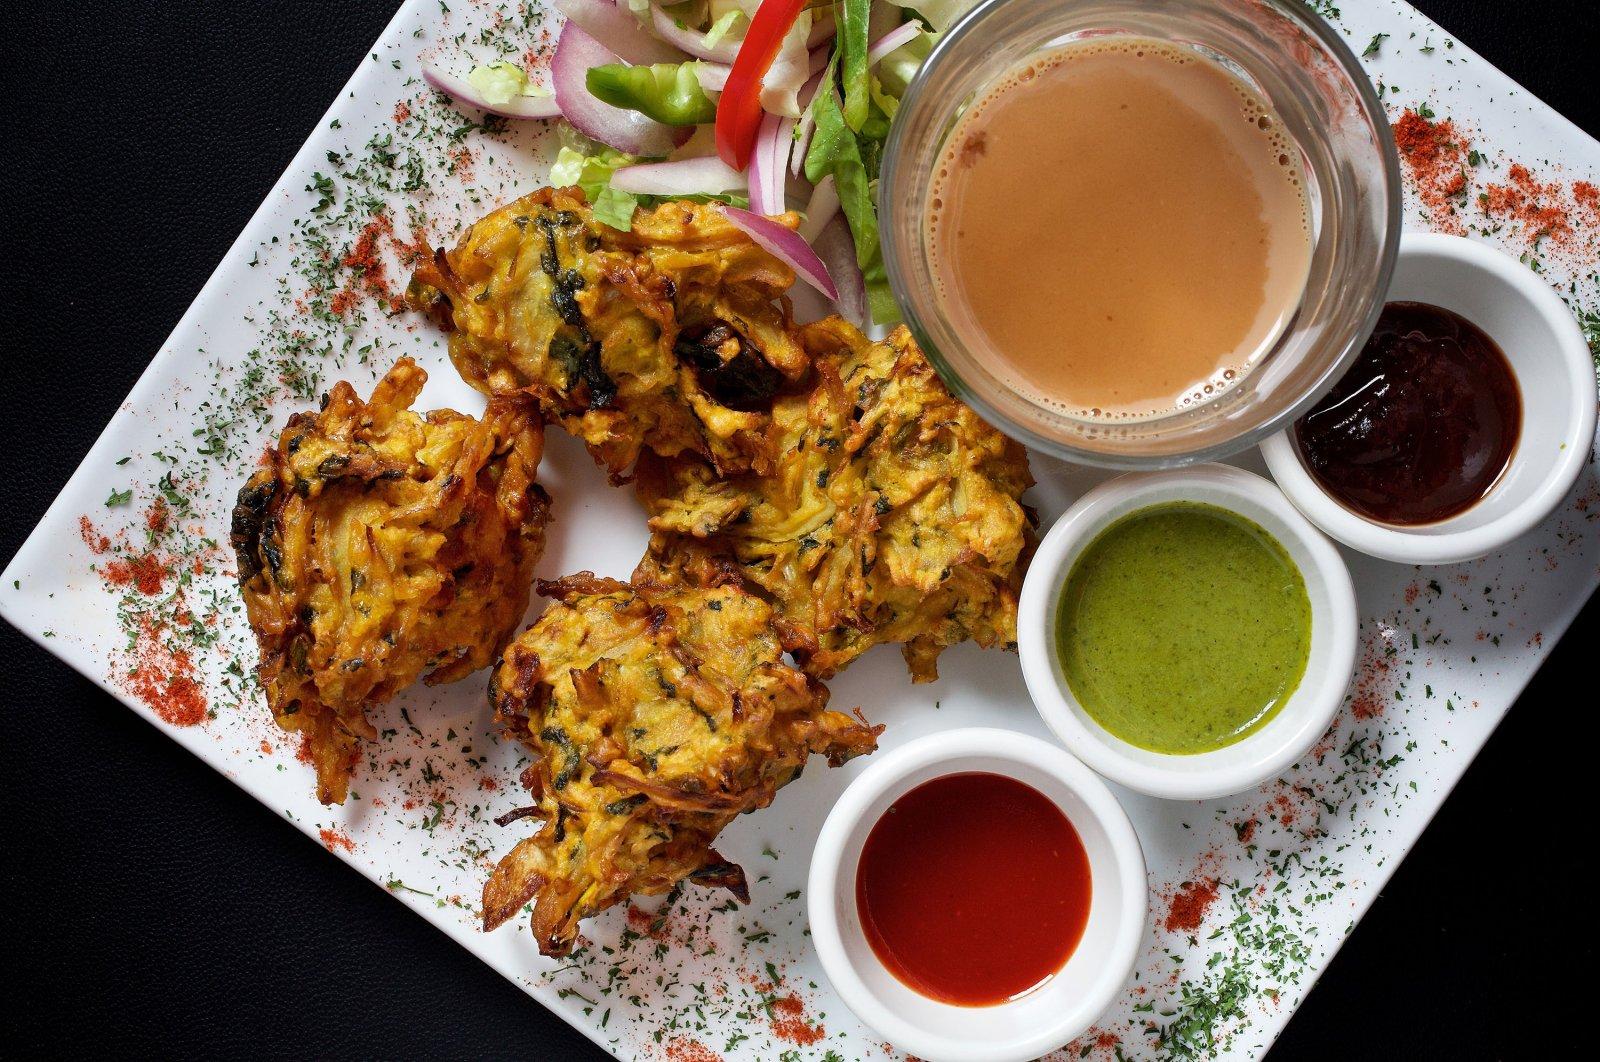 Garam garam pakora (mixed vegetable fritters) photographed at Bombay Street Food in Washington, DC, Dec. 13, 2018. (Getty Images).